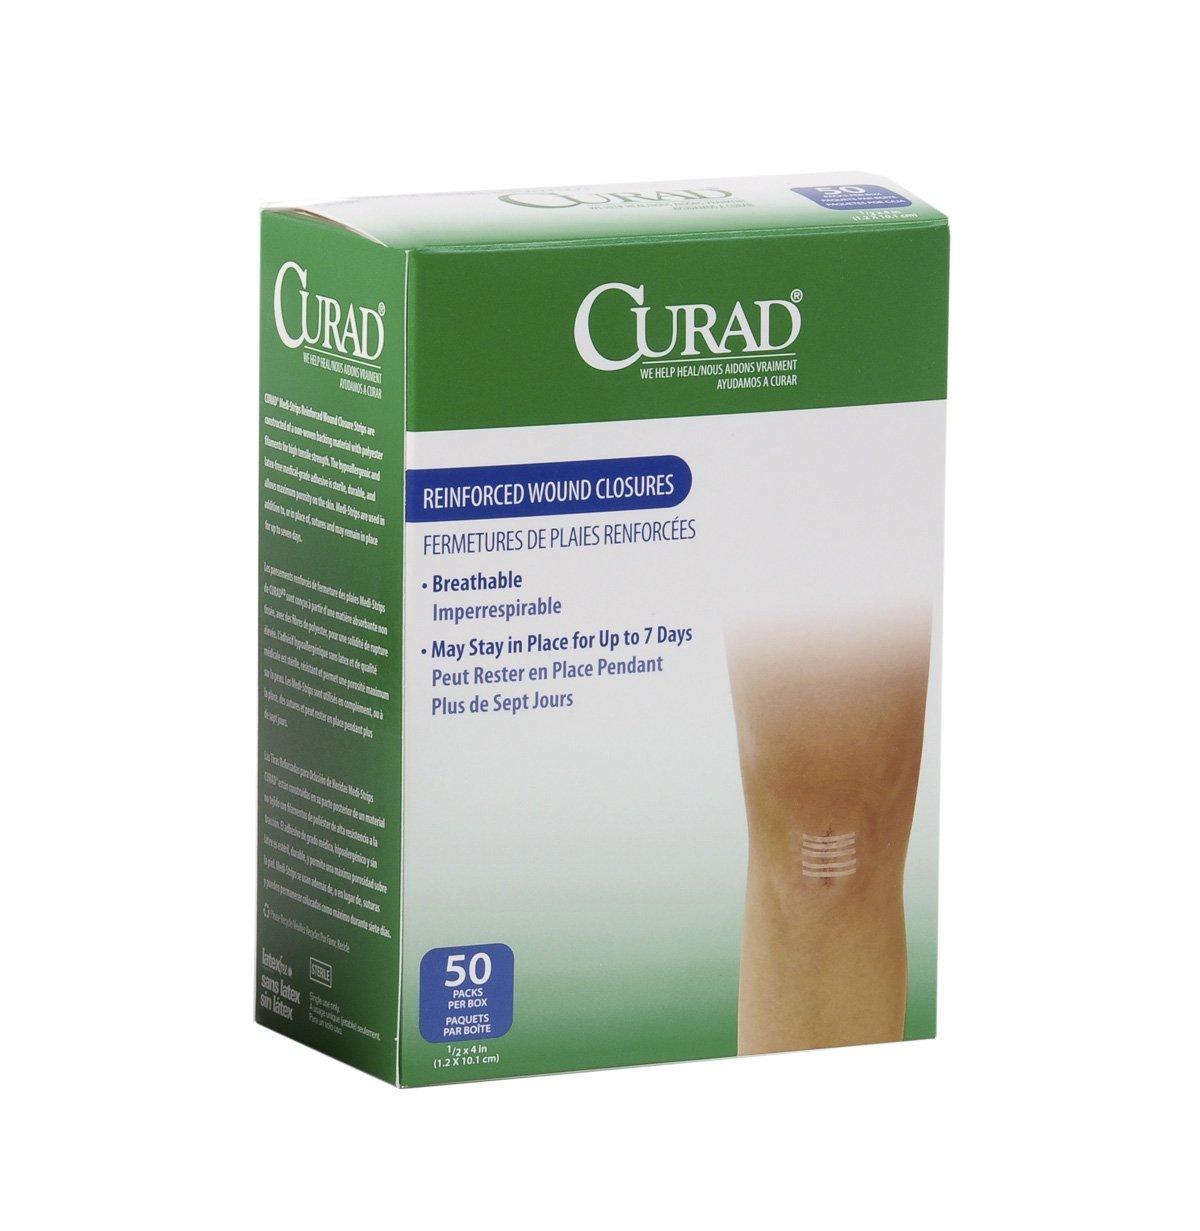 Curad NON250414 Sterile Medi-Strips, 1/4'' x 4'', White (Pack of 2000)